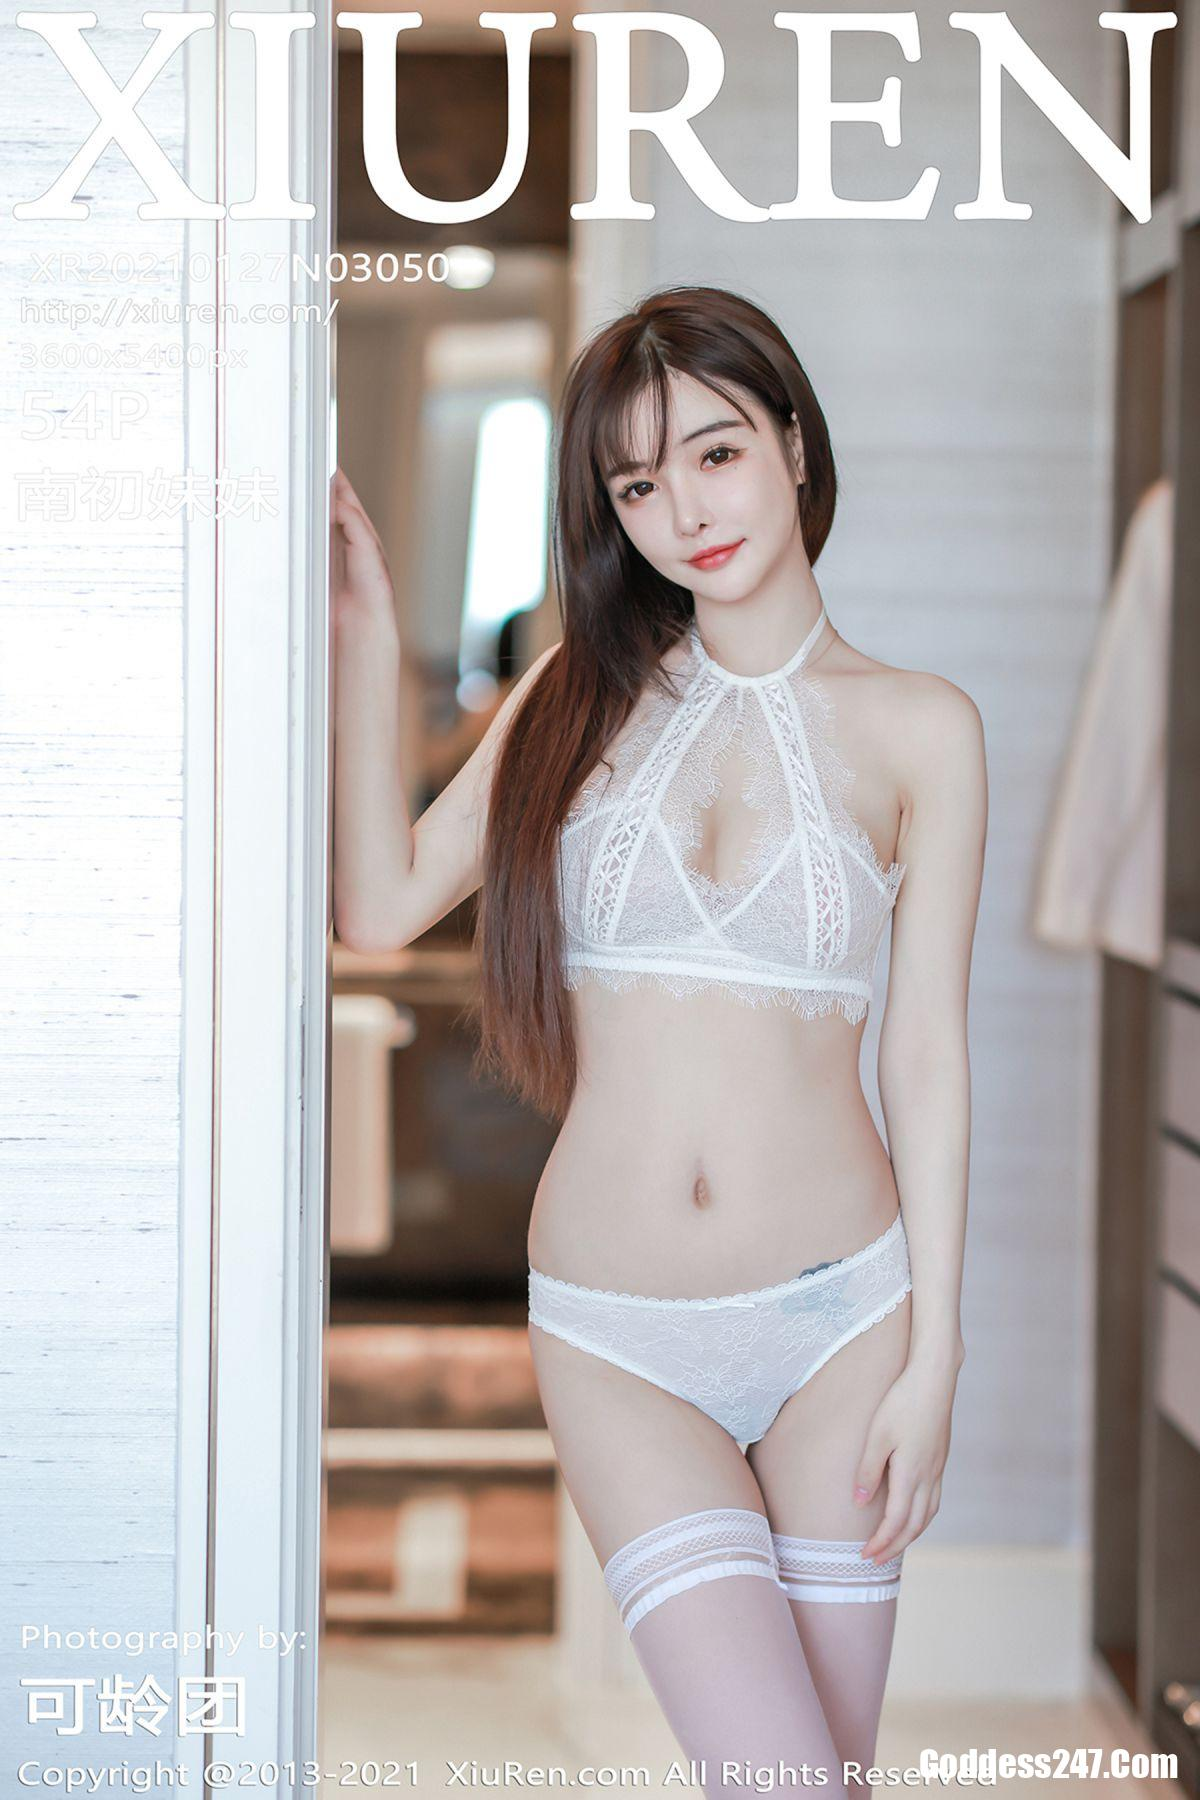 XiuRen秀人网 No.3050 南初妹妹